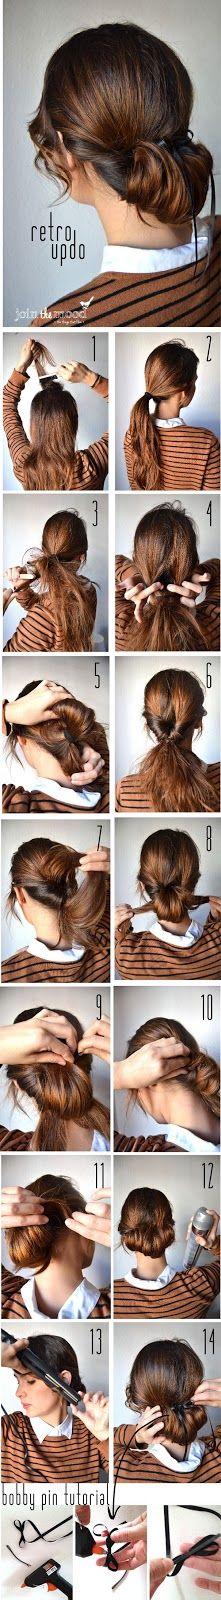 Hair tutorial: RETRO UPDO